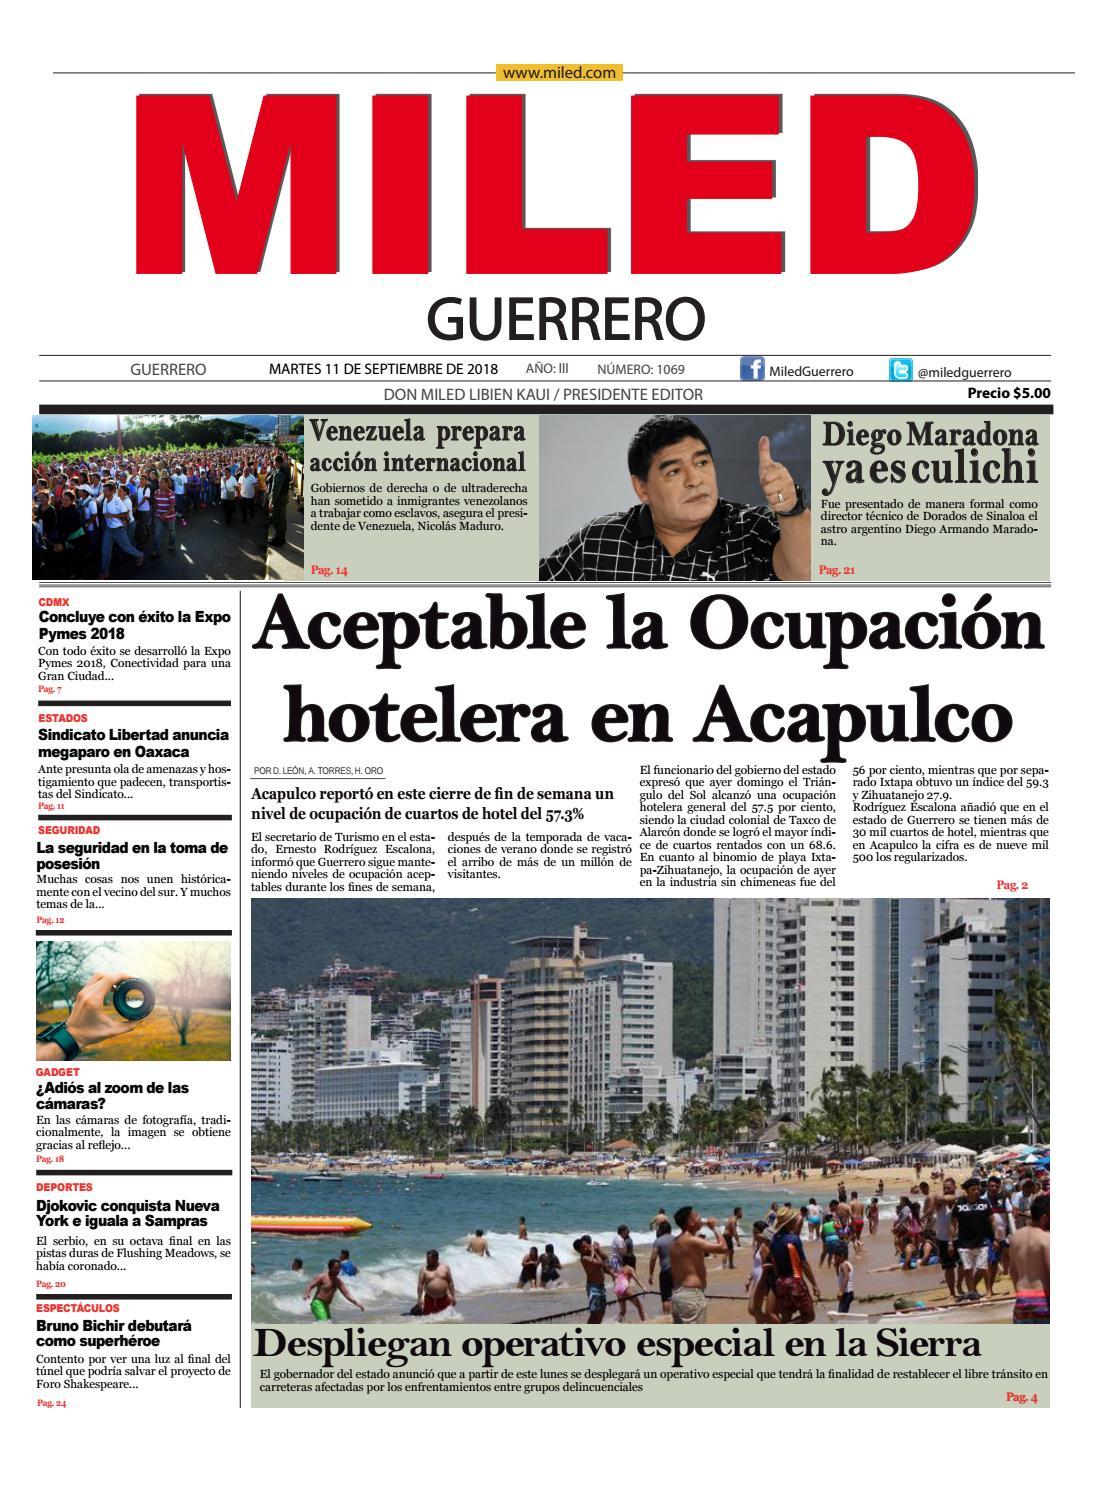 Miled Guerrero 11 09 18 by Miled Estados - issuu e11c48c3784